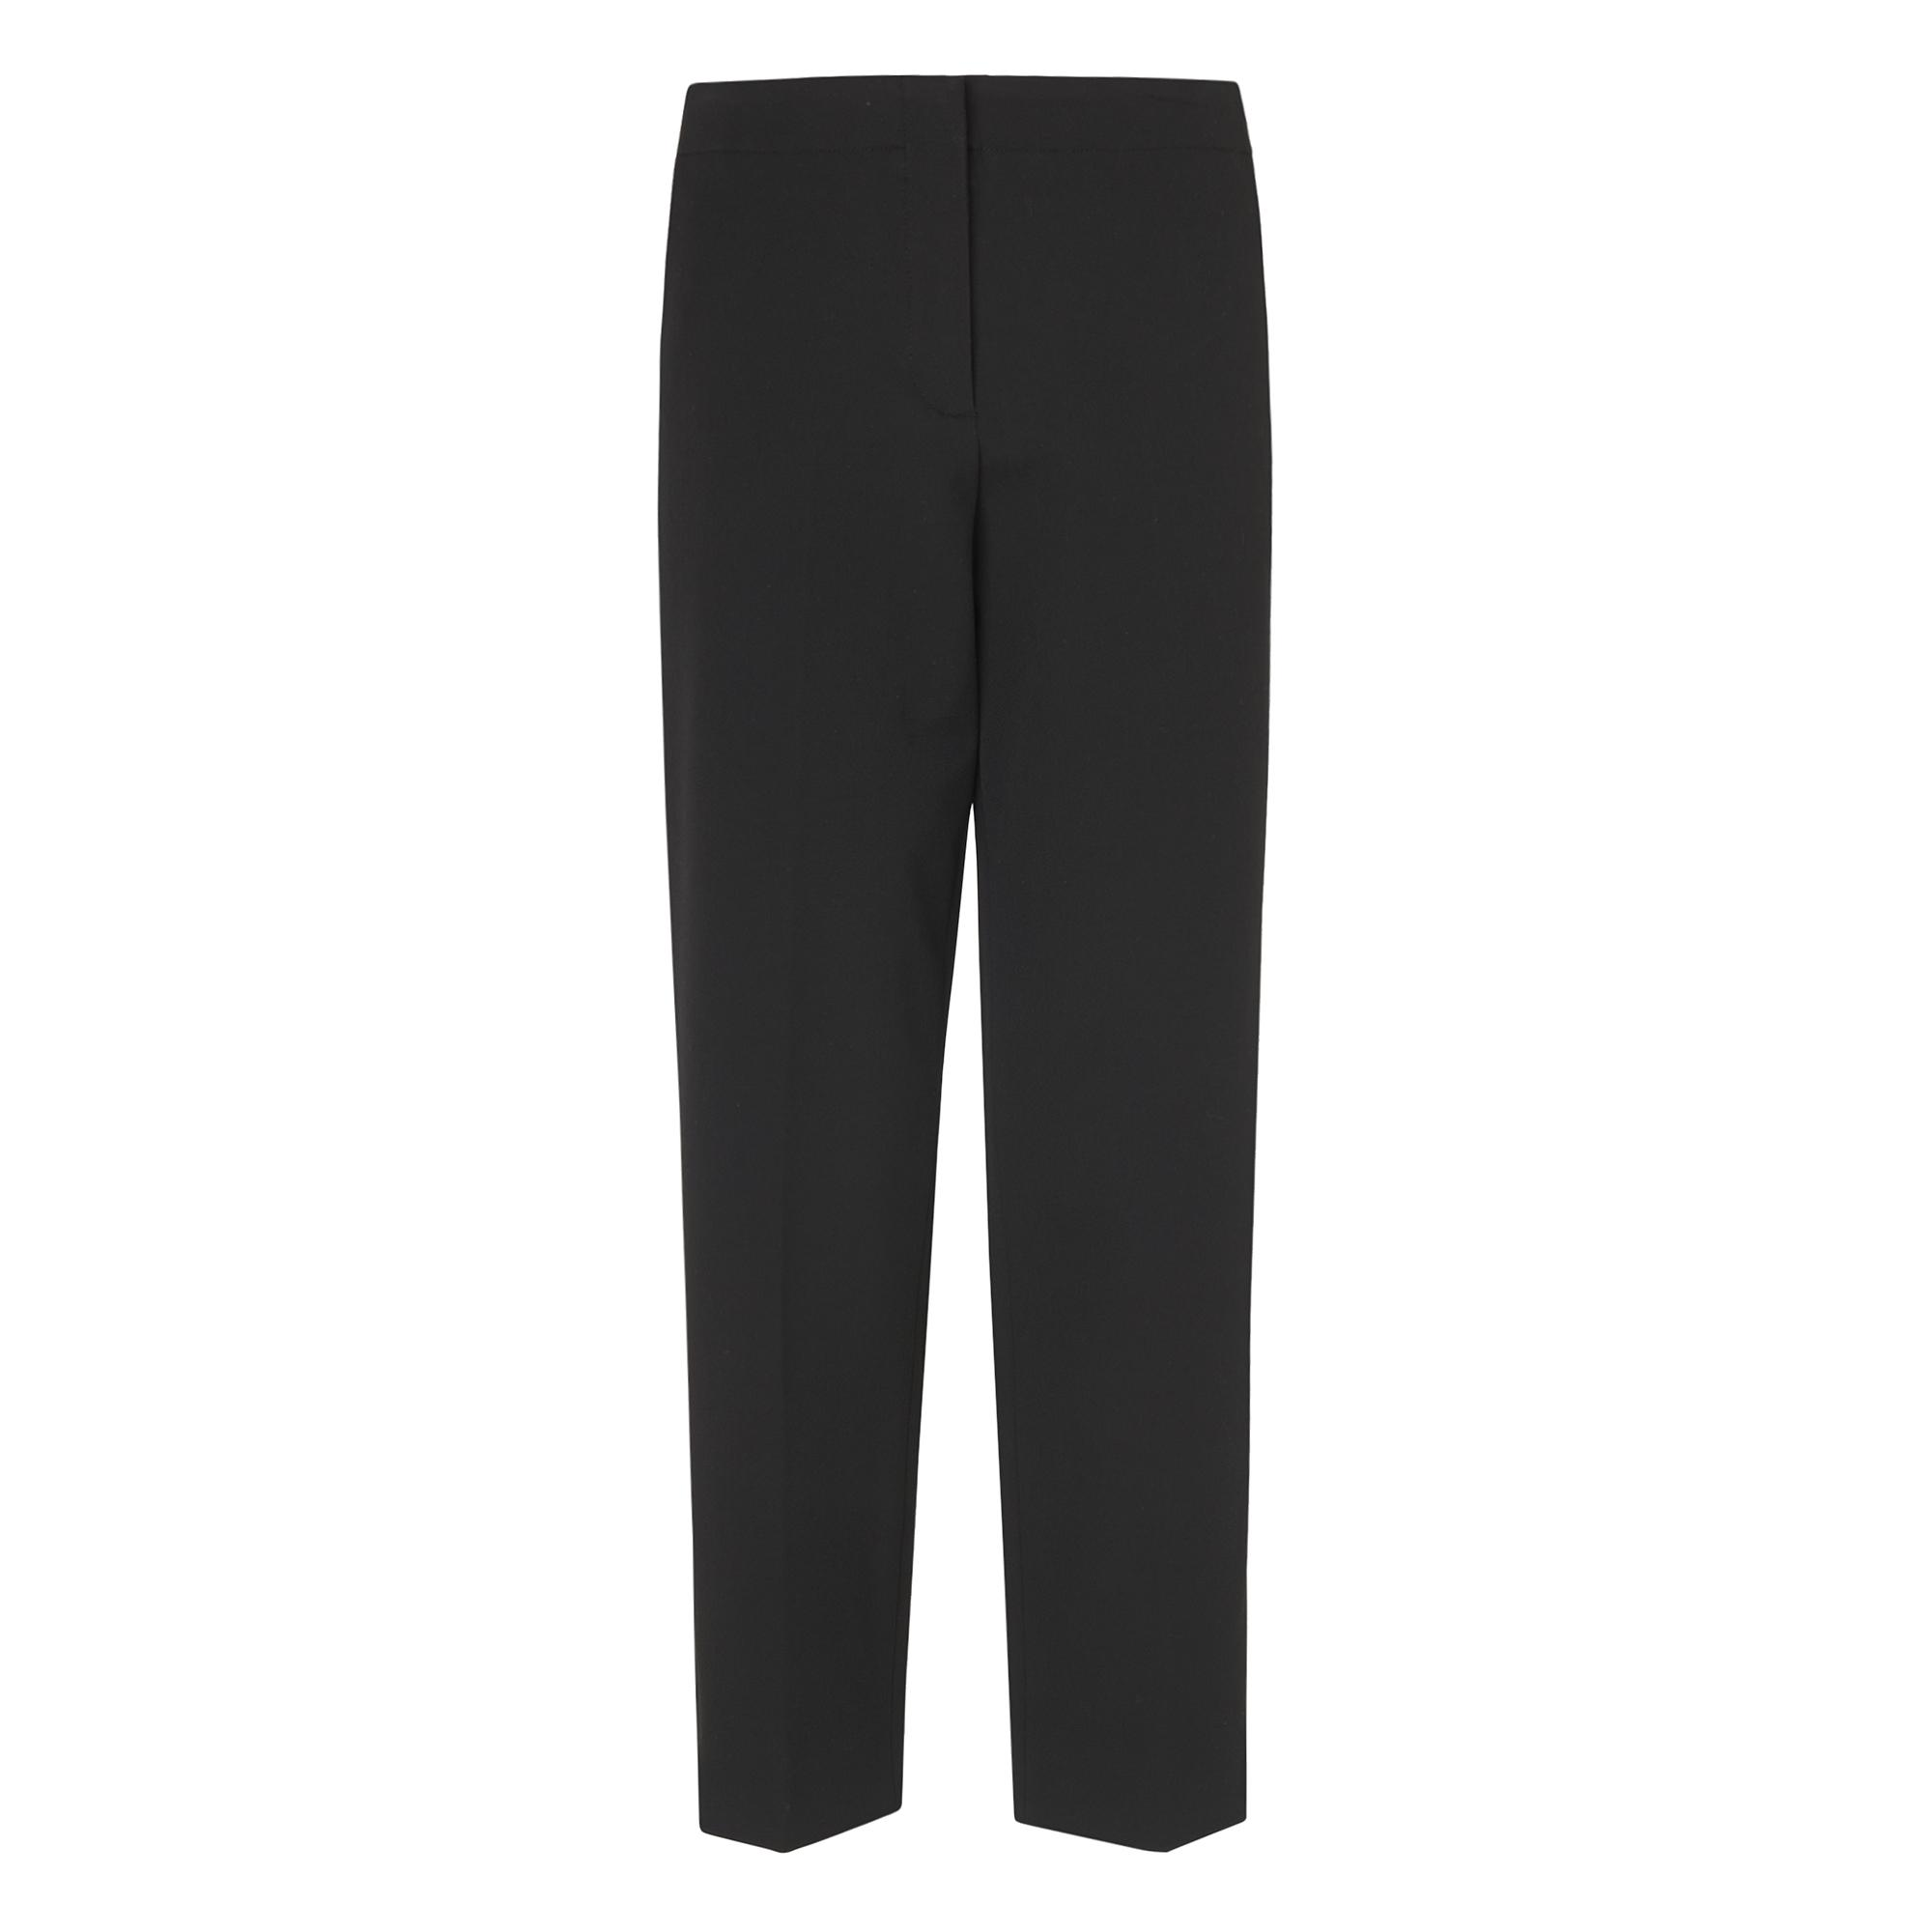 Relia Black Trousers